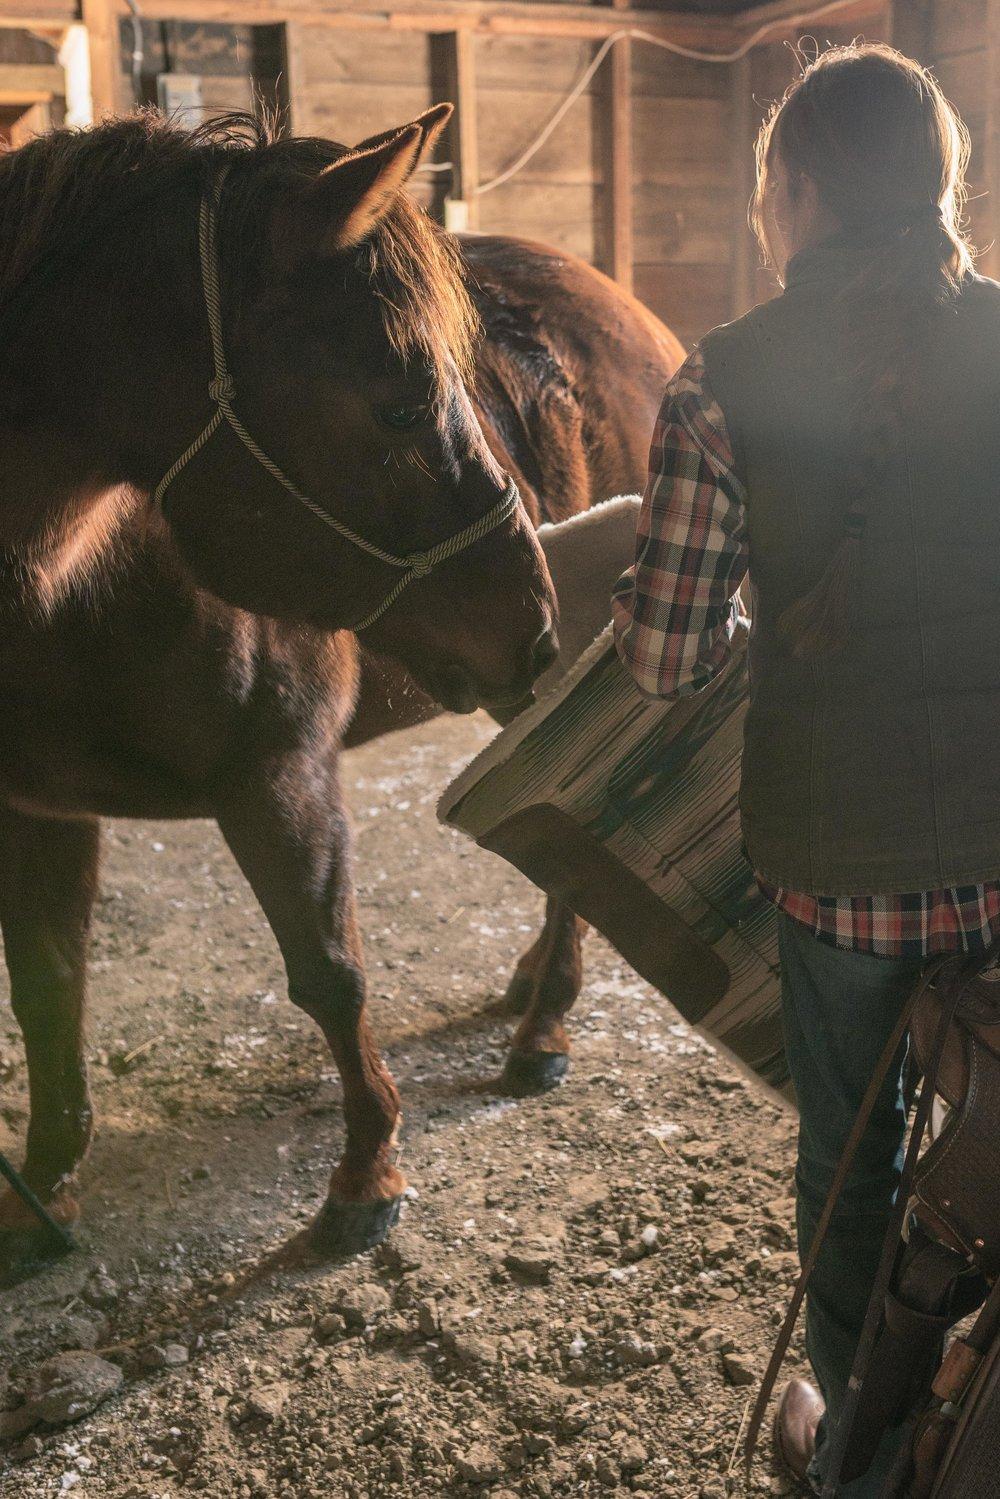 Jenna Flatgard wearing Tecovas while working her horse in her barn in eastern Montana.